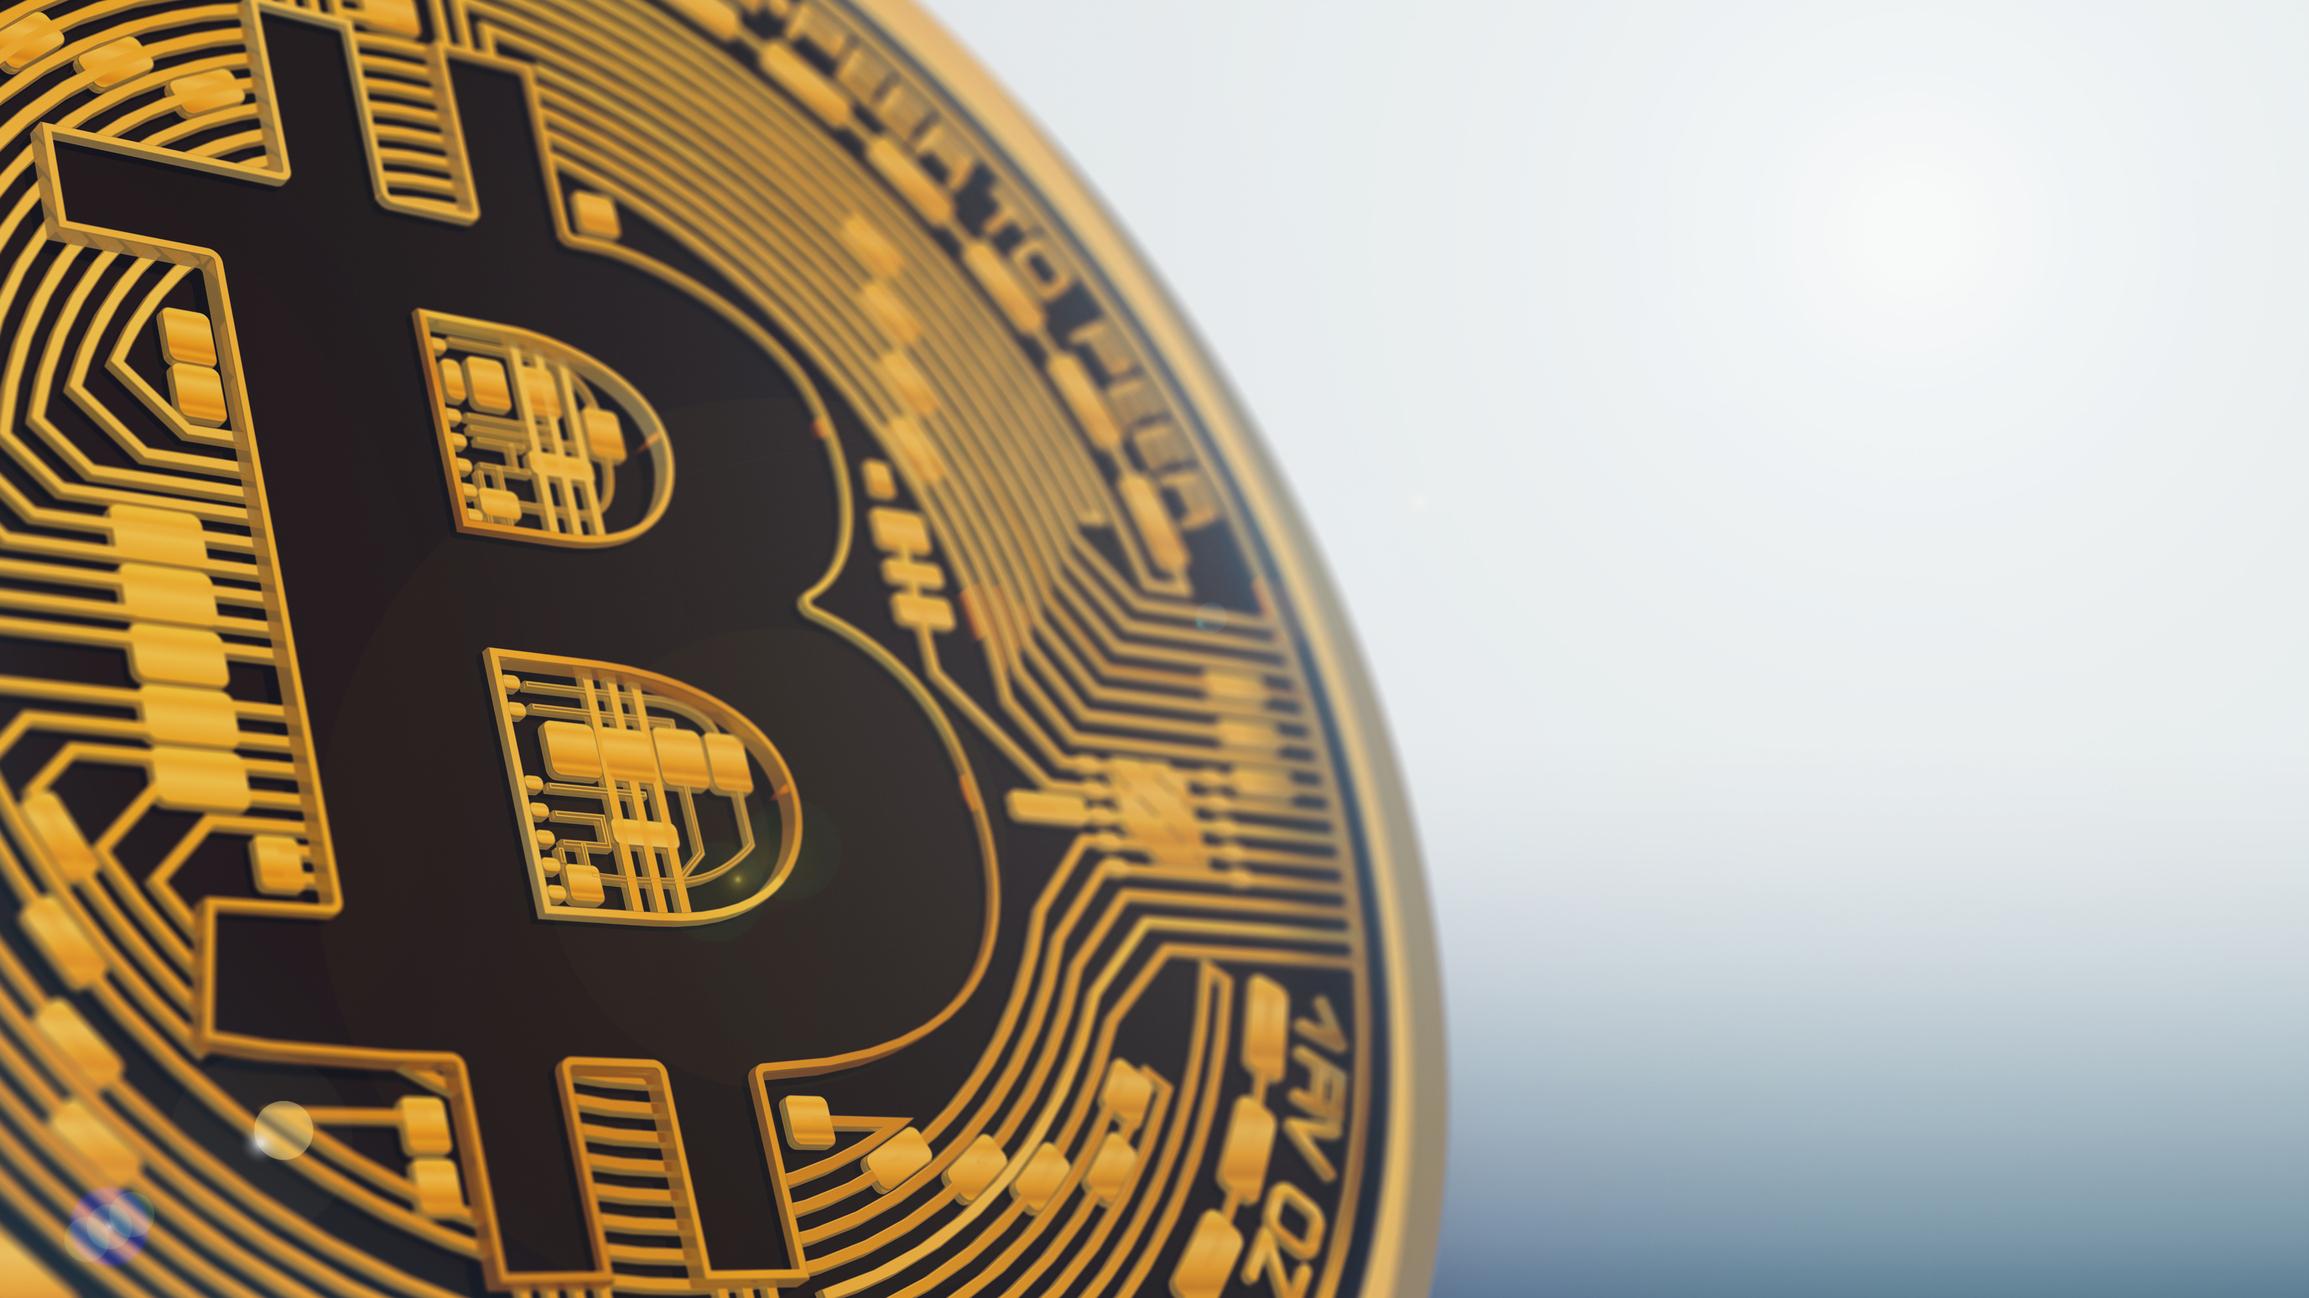 A physical gold bitcoin up close.